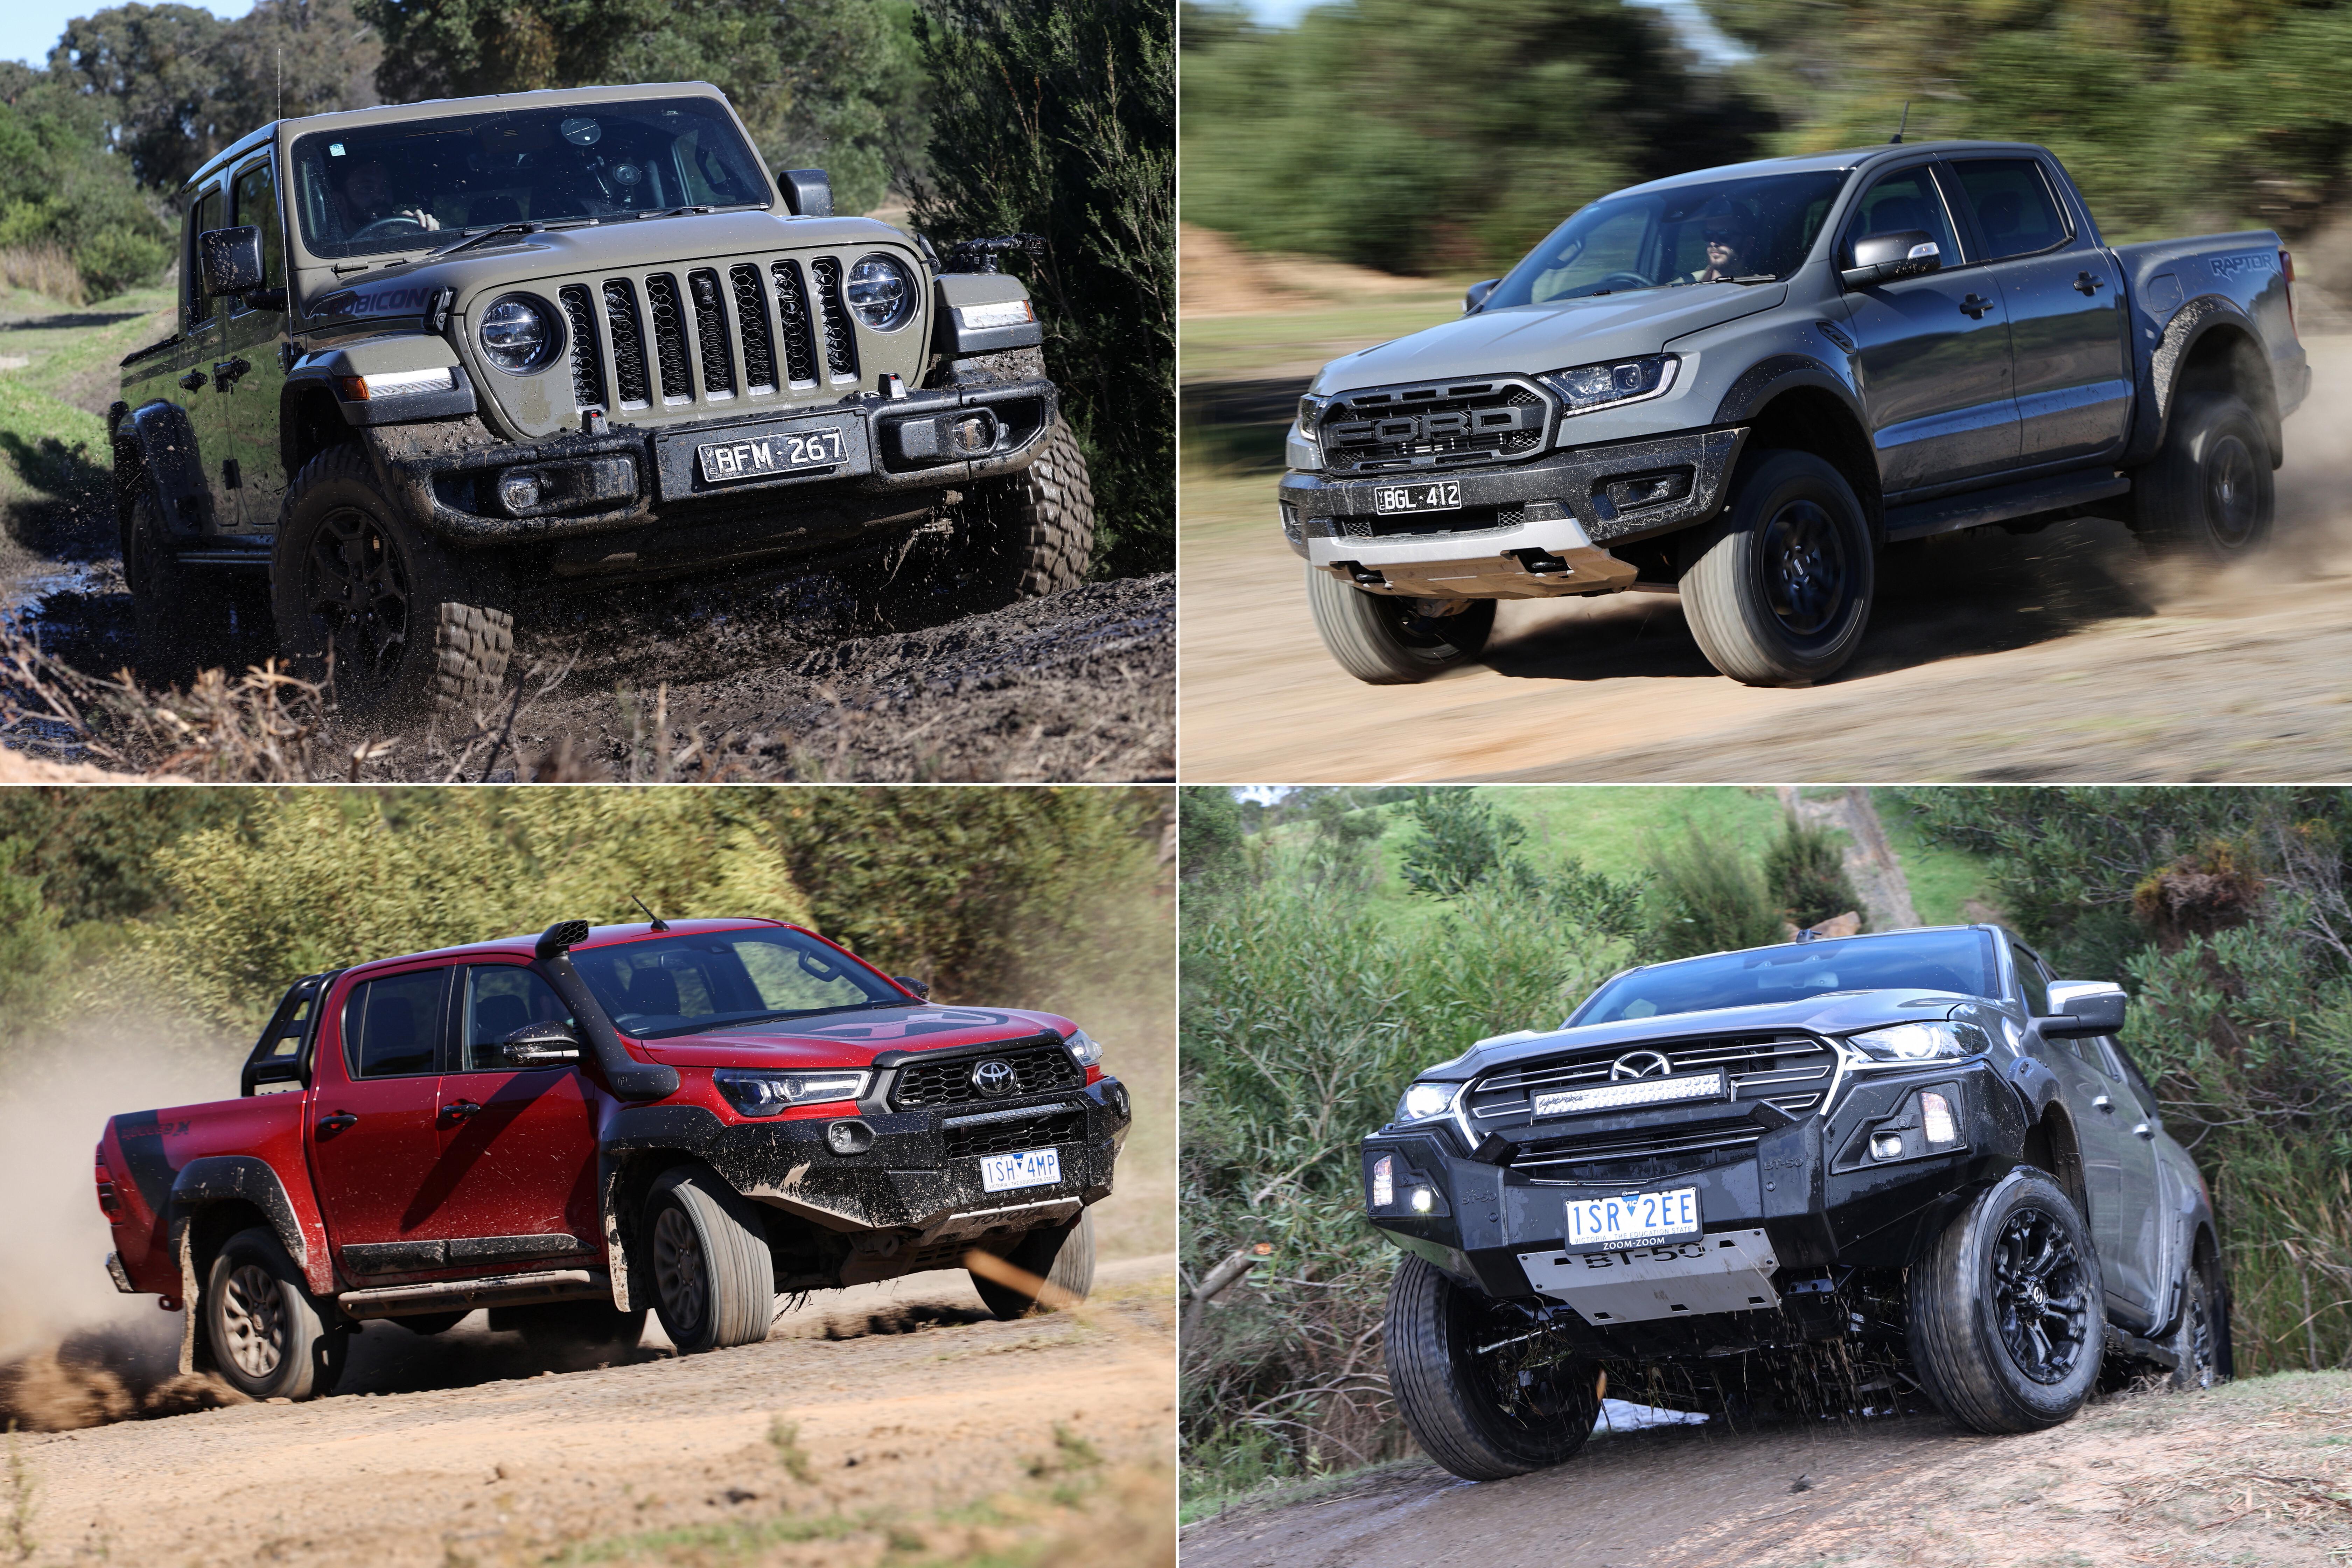 2021 Ford Ranger Raptor vs Jeep Gladiator Rubicon vs Mazda BT-50 Thunder vs Toyota Hilux Rugged X comparison test